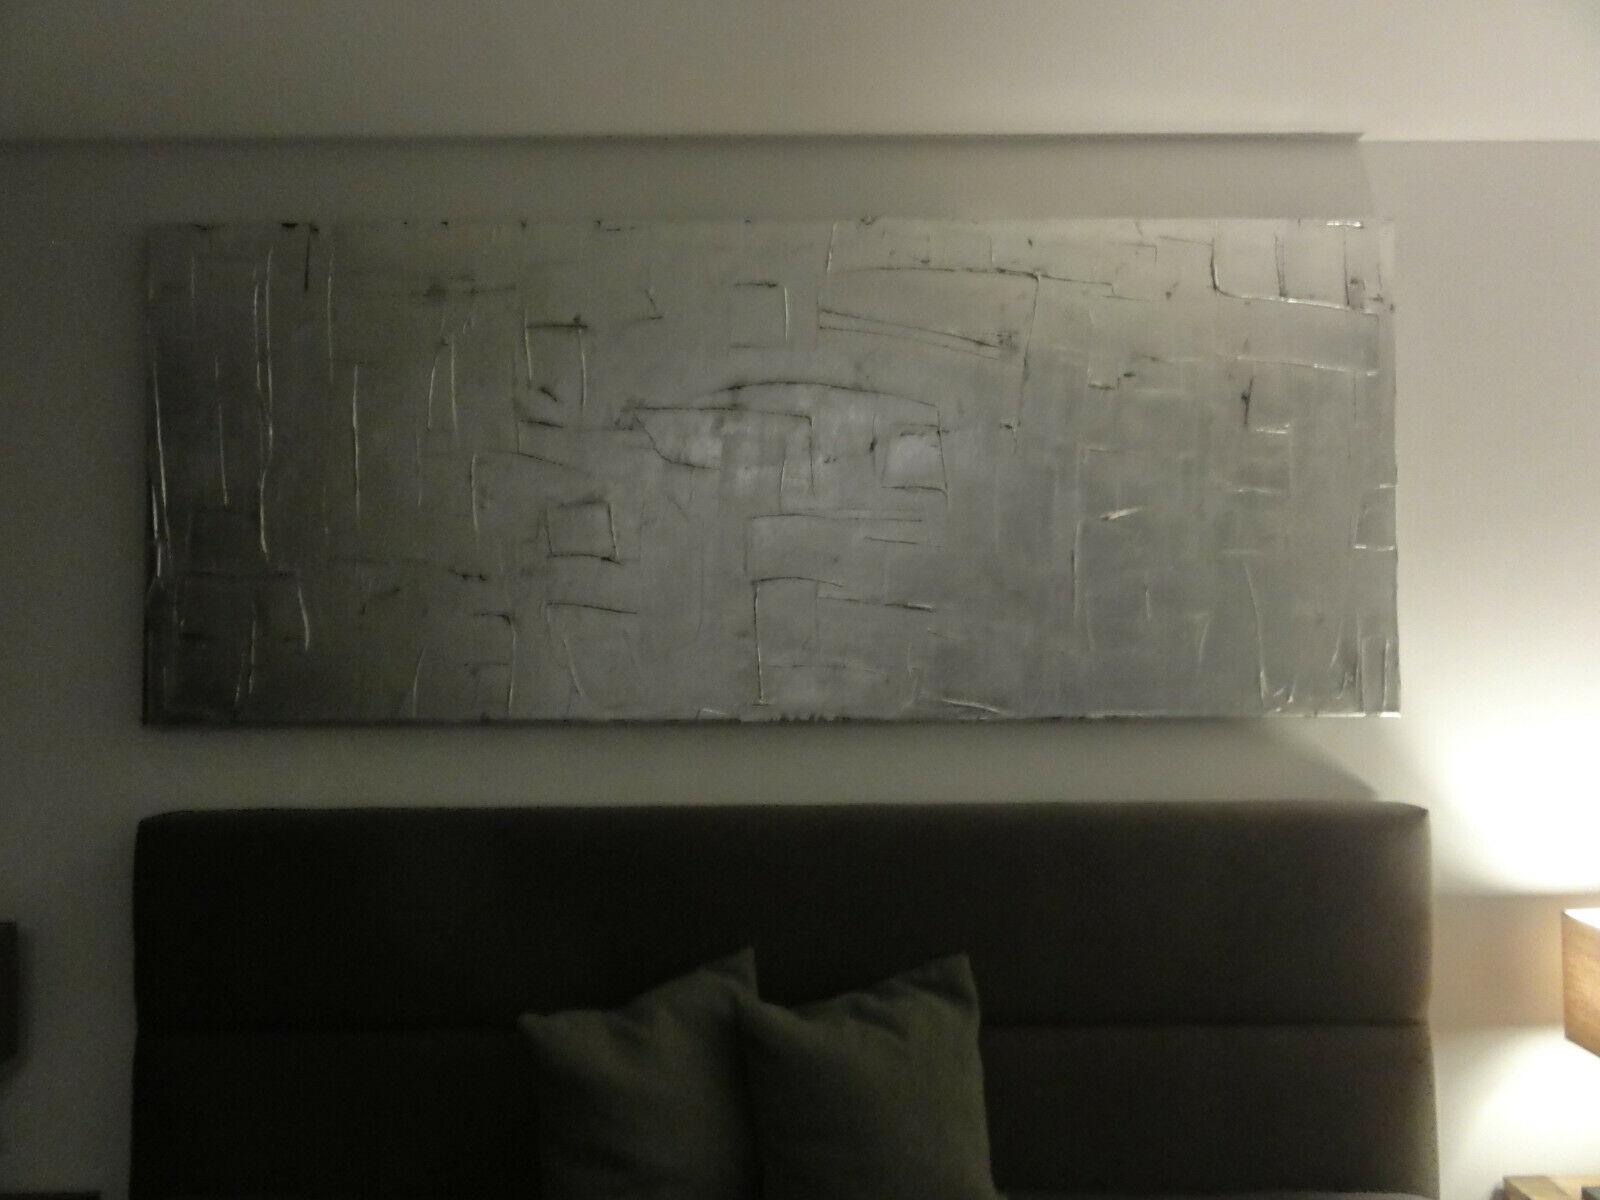 Acrylbild leinwand schwarz silber modern abstrakt unikat handgemalt 200x80